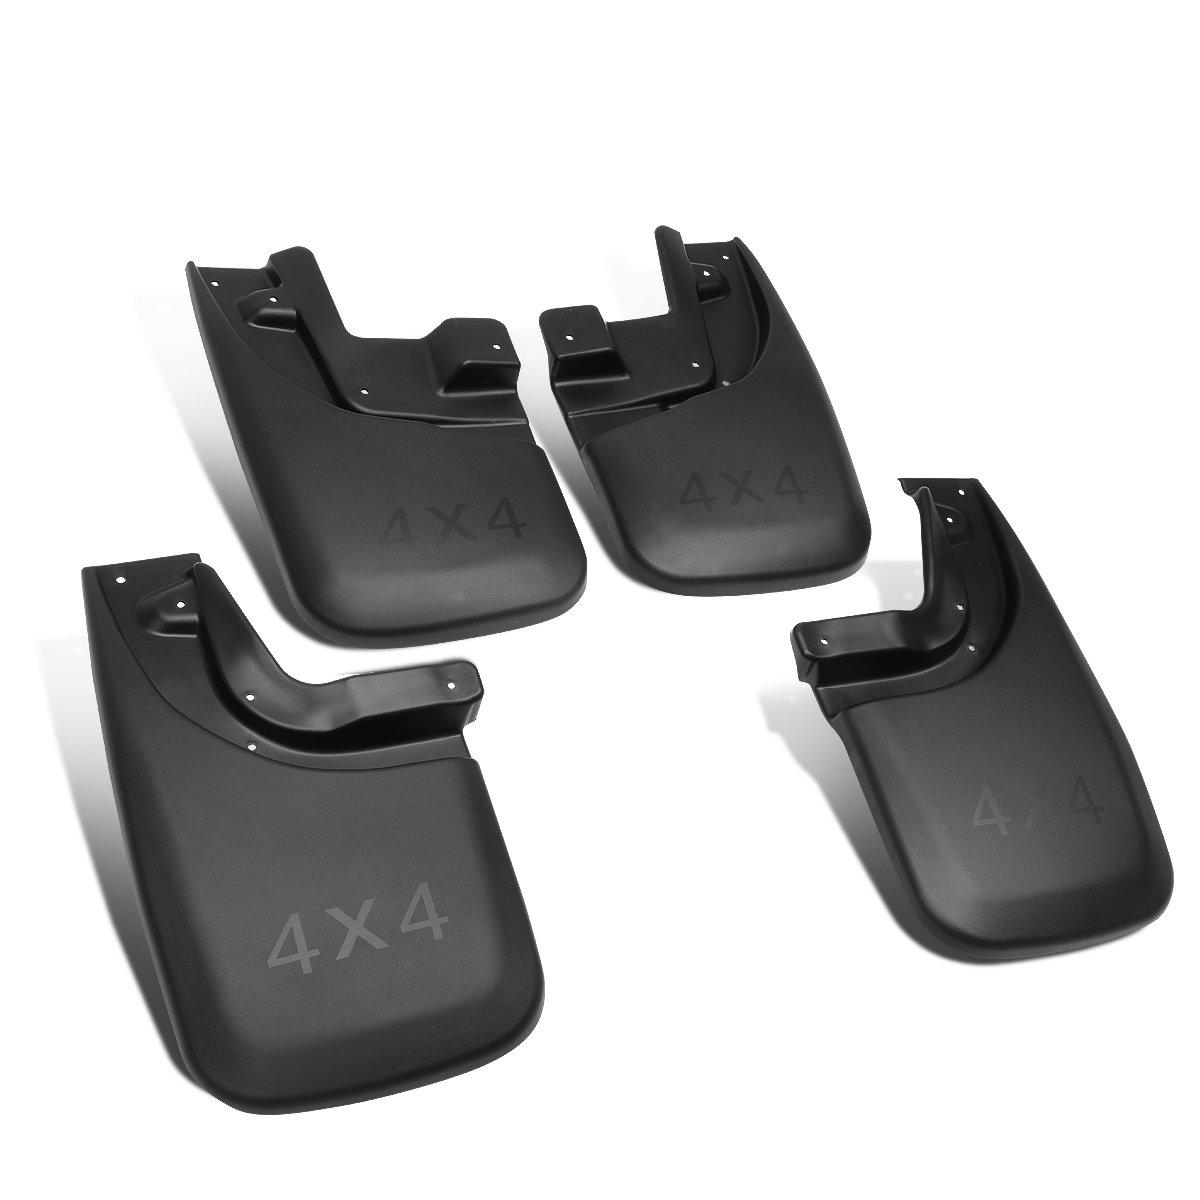 DNA MOTORING WFMK-007 4Pcs Mud Guard Splash Flap Kit for 14-18 Silverado//Sierra